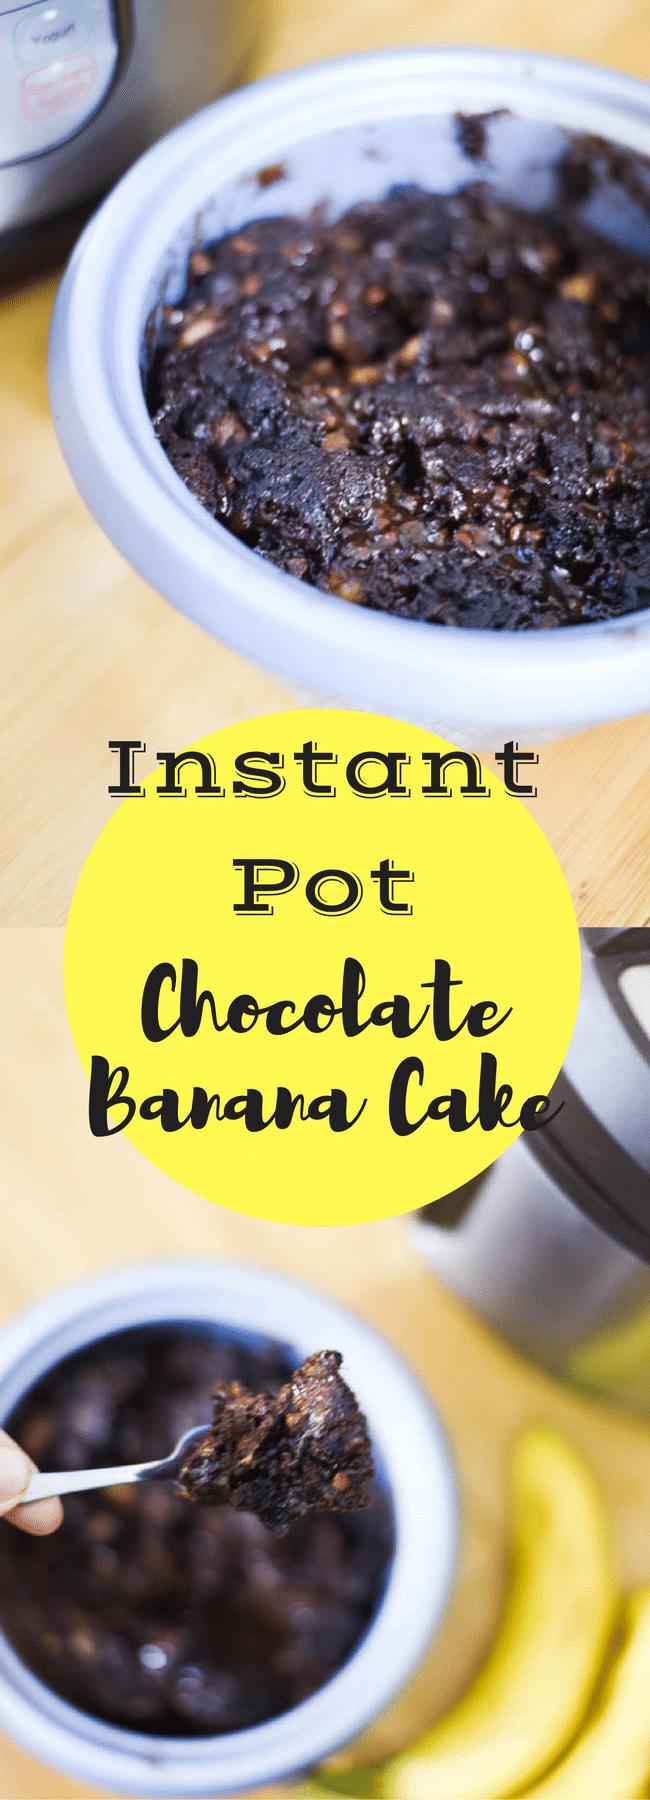 Instant Pot Chocolate Banana Cake / Instant Pot Recipes / Instant Pot Desserts / Instant Pot Quick Breads / Instant Pot Ideas